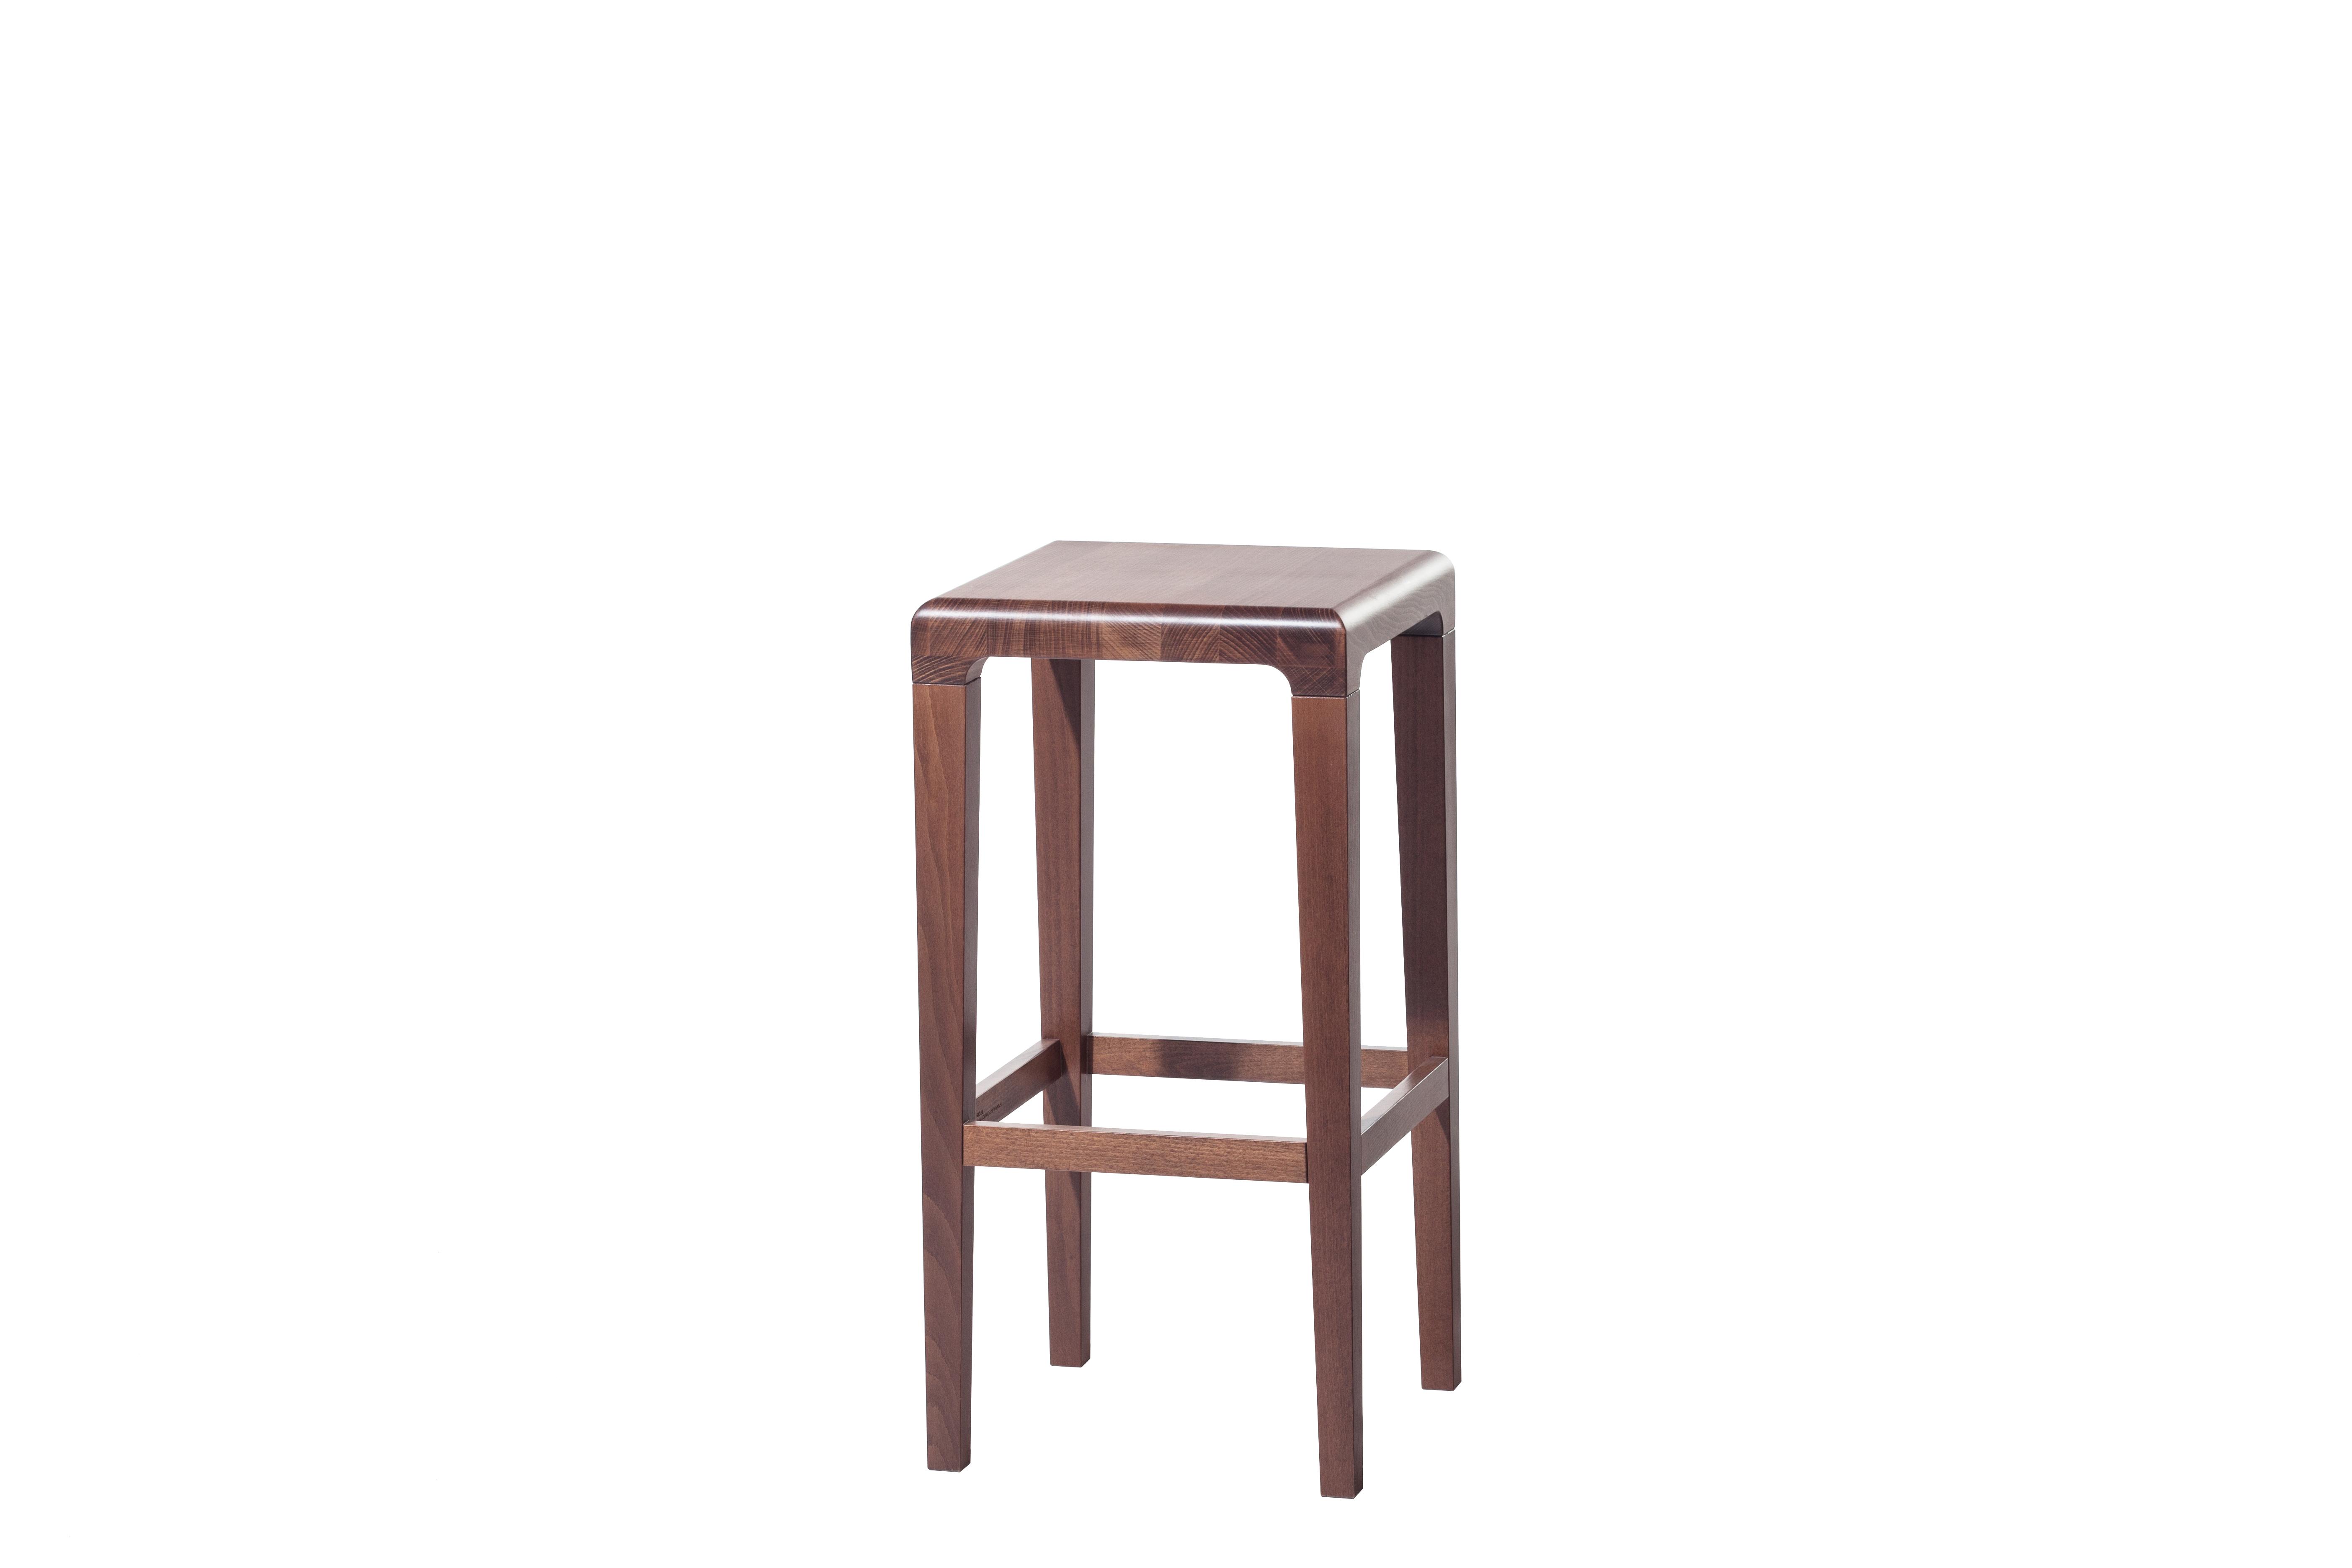 Scaun din lemn de stejar Rioja Brown Small, l32xA32xH64 cm imagine